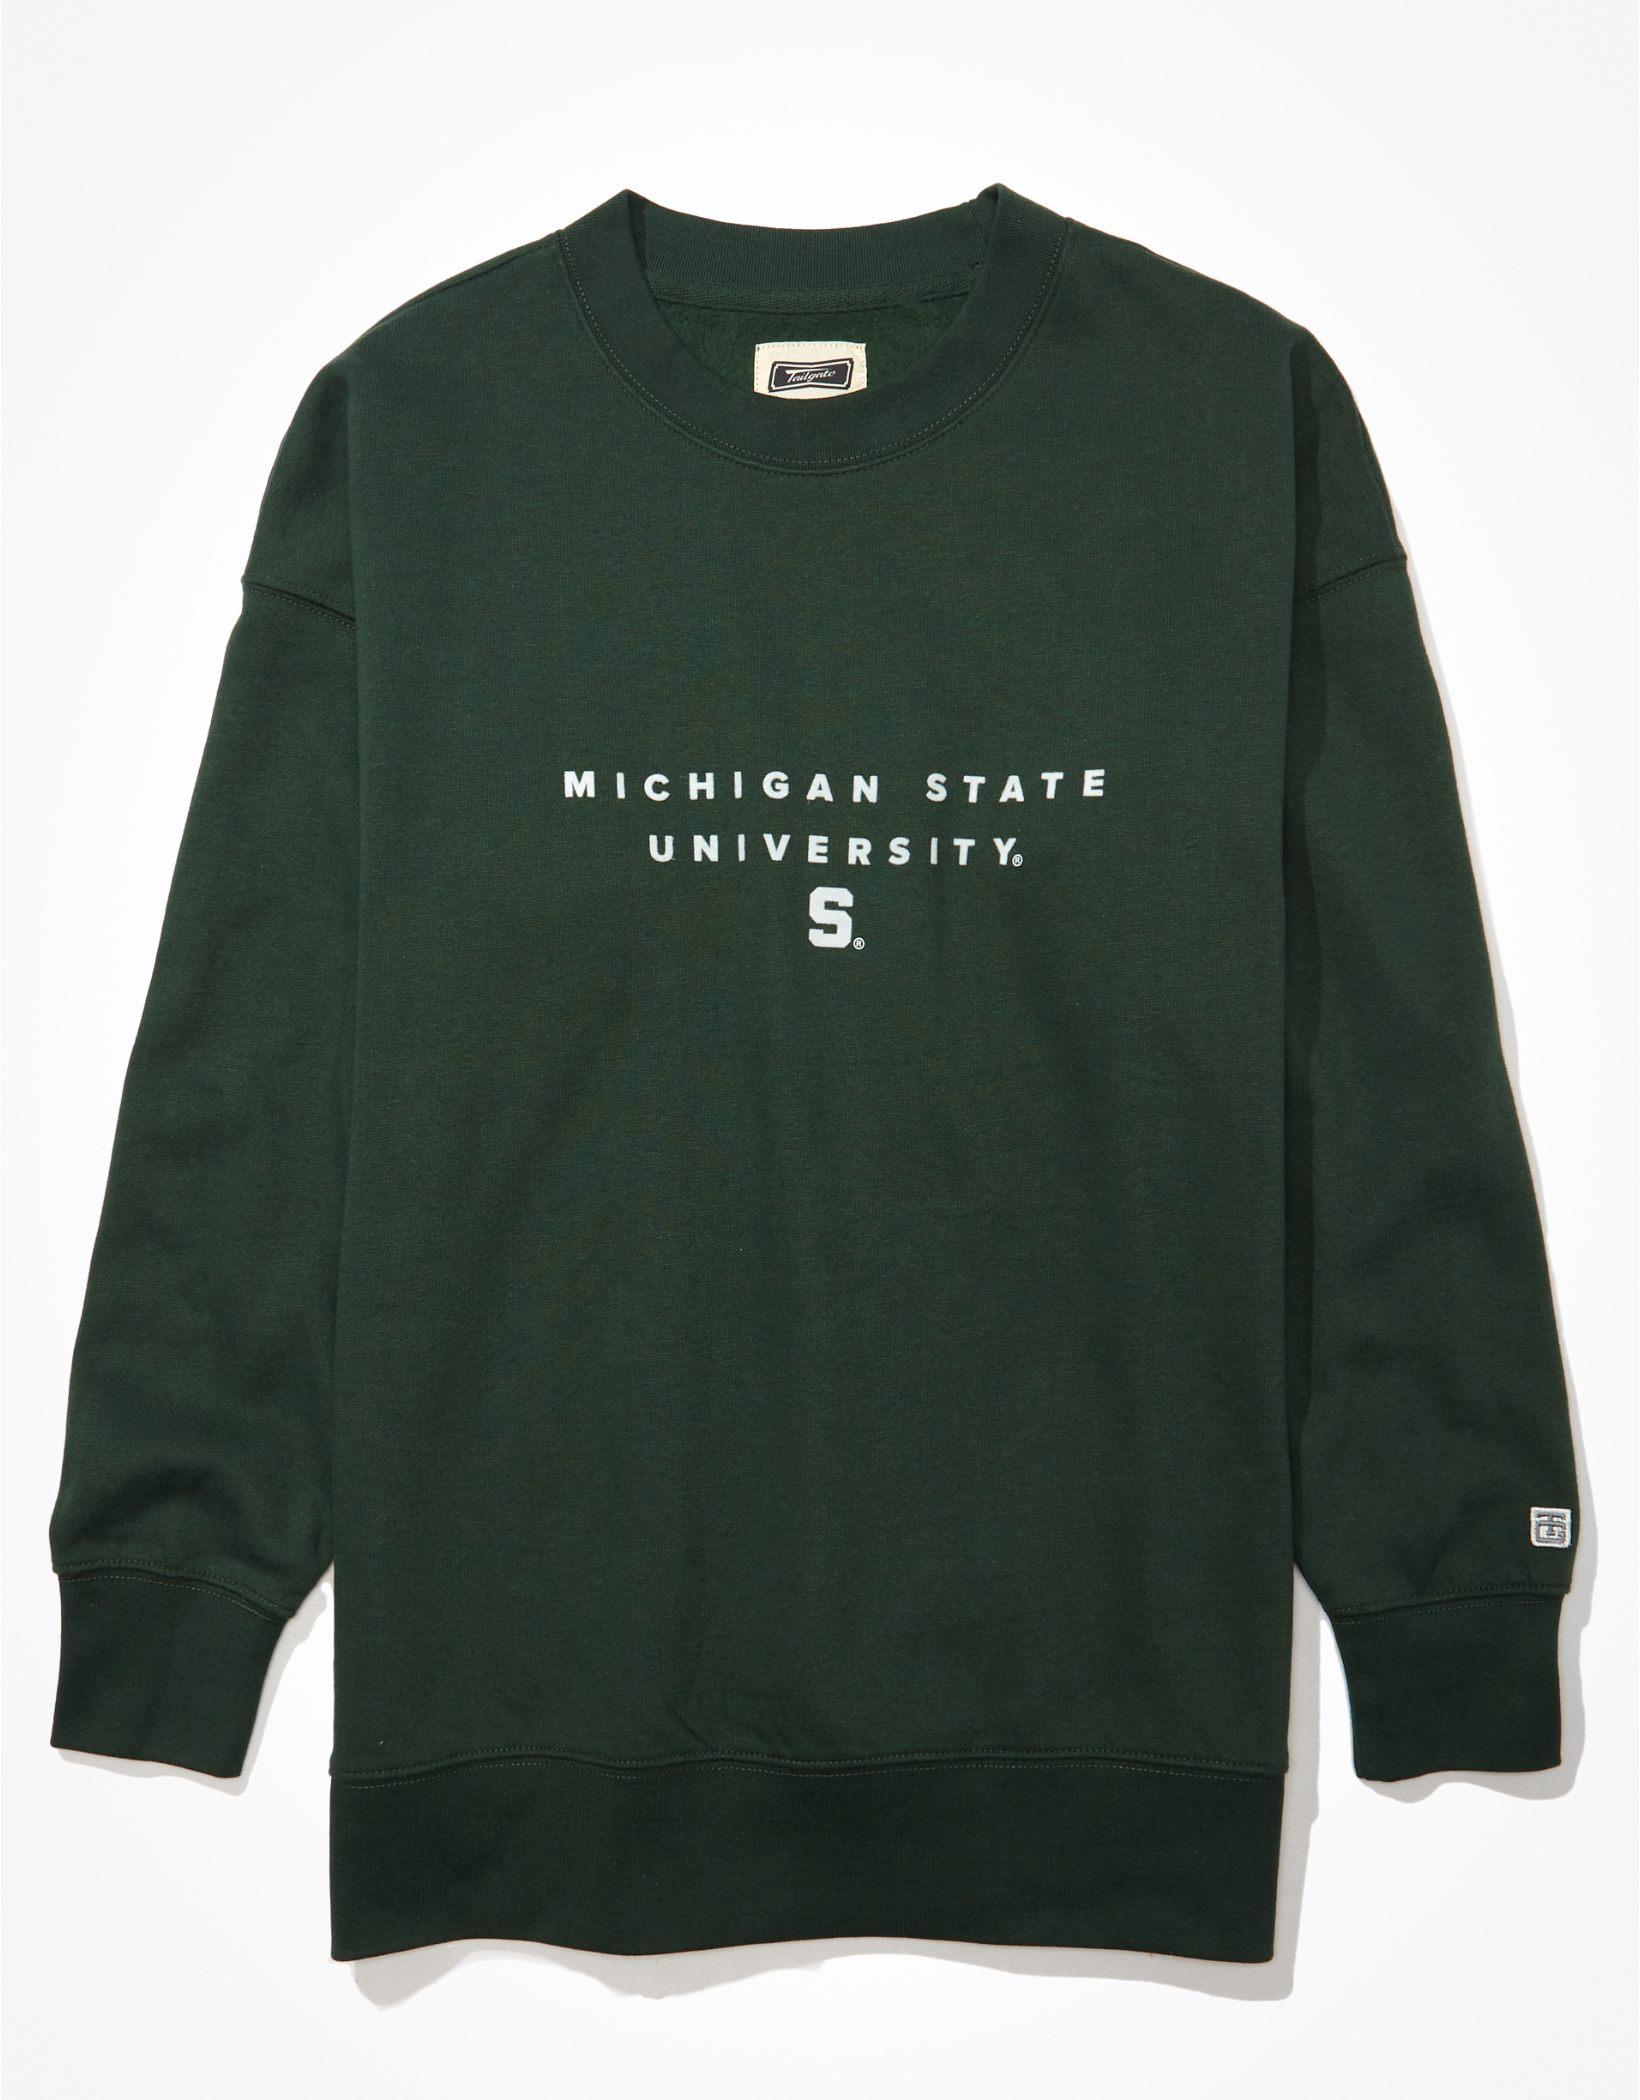 Tailgate Women's Michigan State Spartans Oversized Sweatshirt